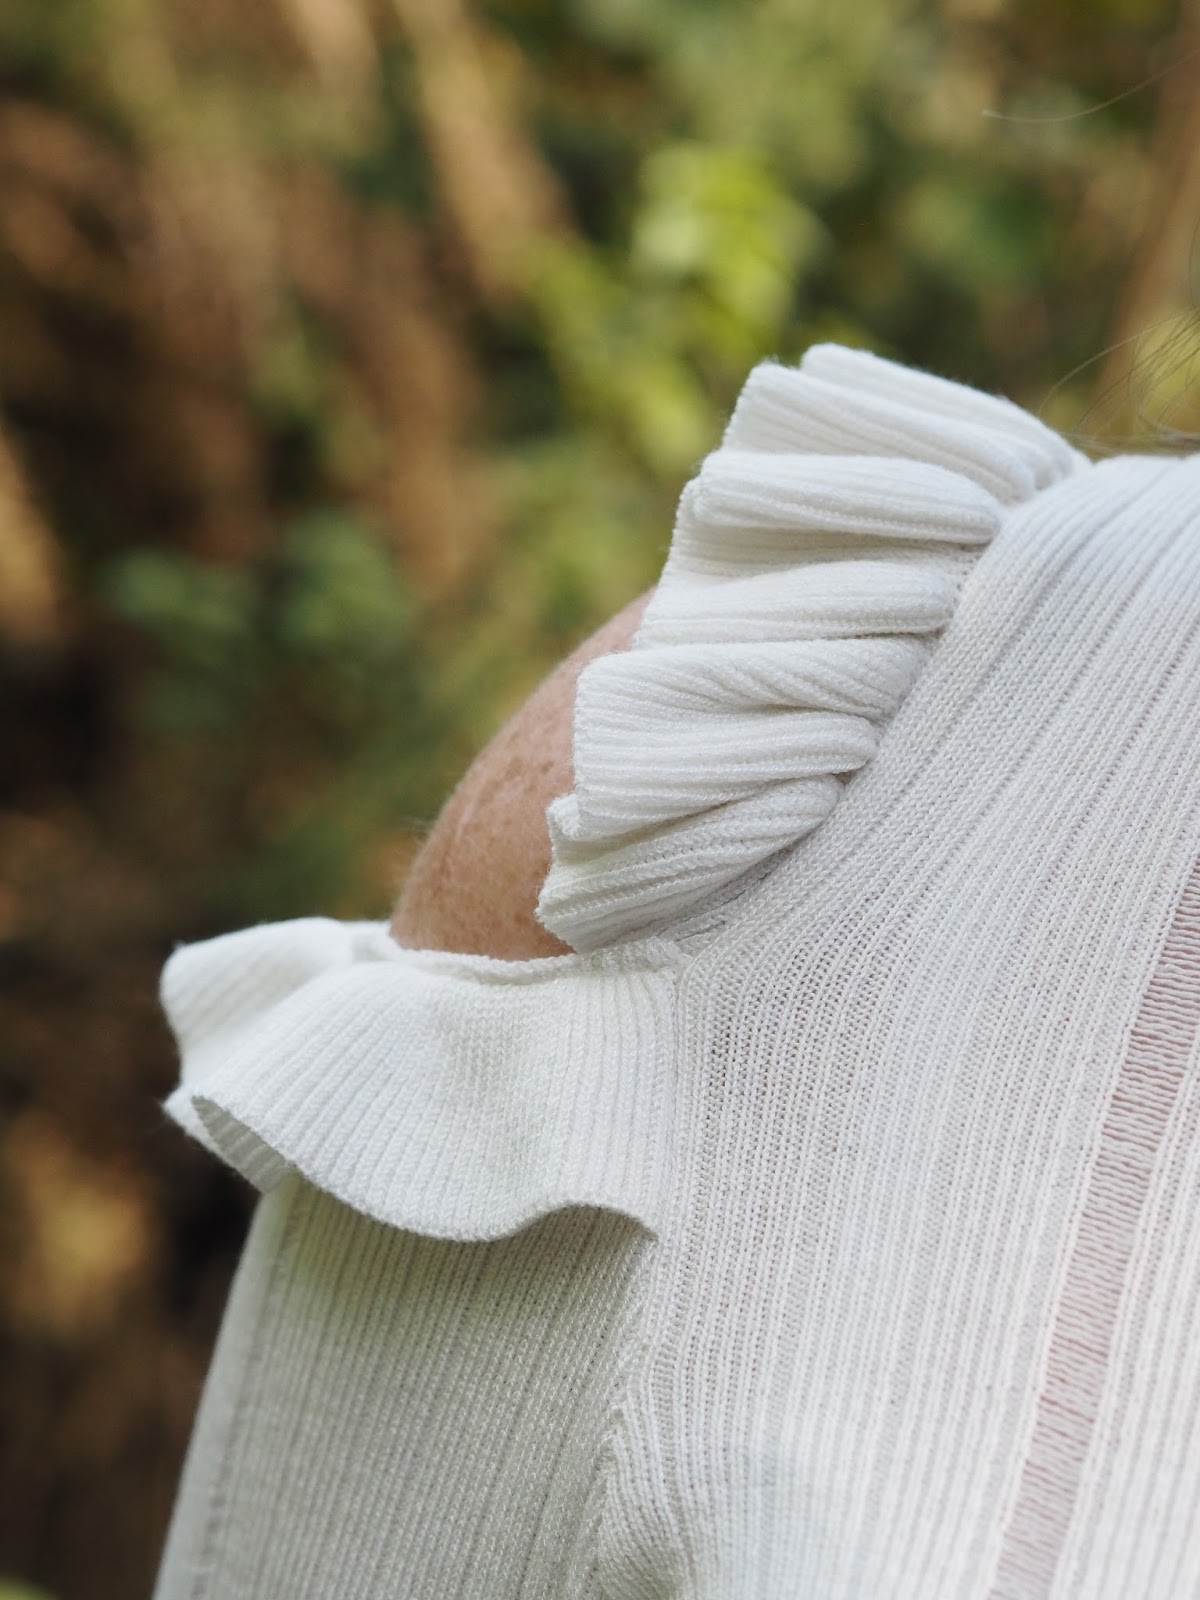 Autumn fashion Topshop knitwear Priceless Life of Mine